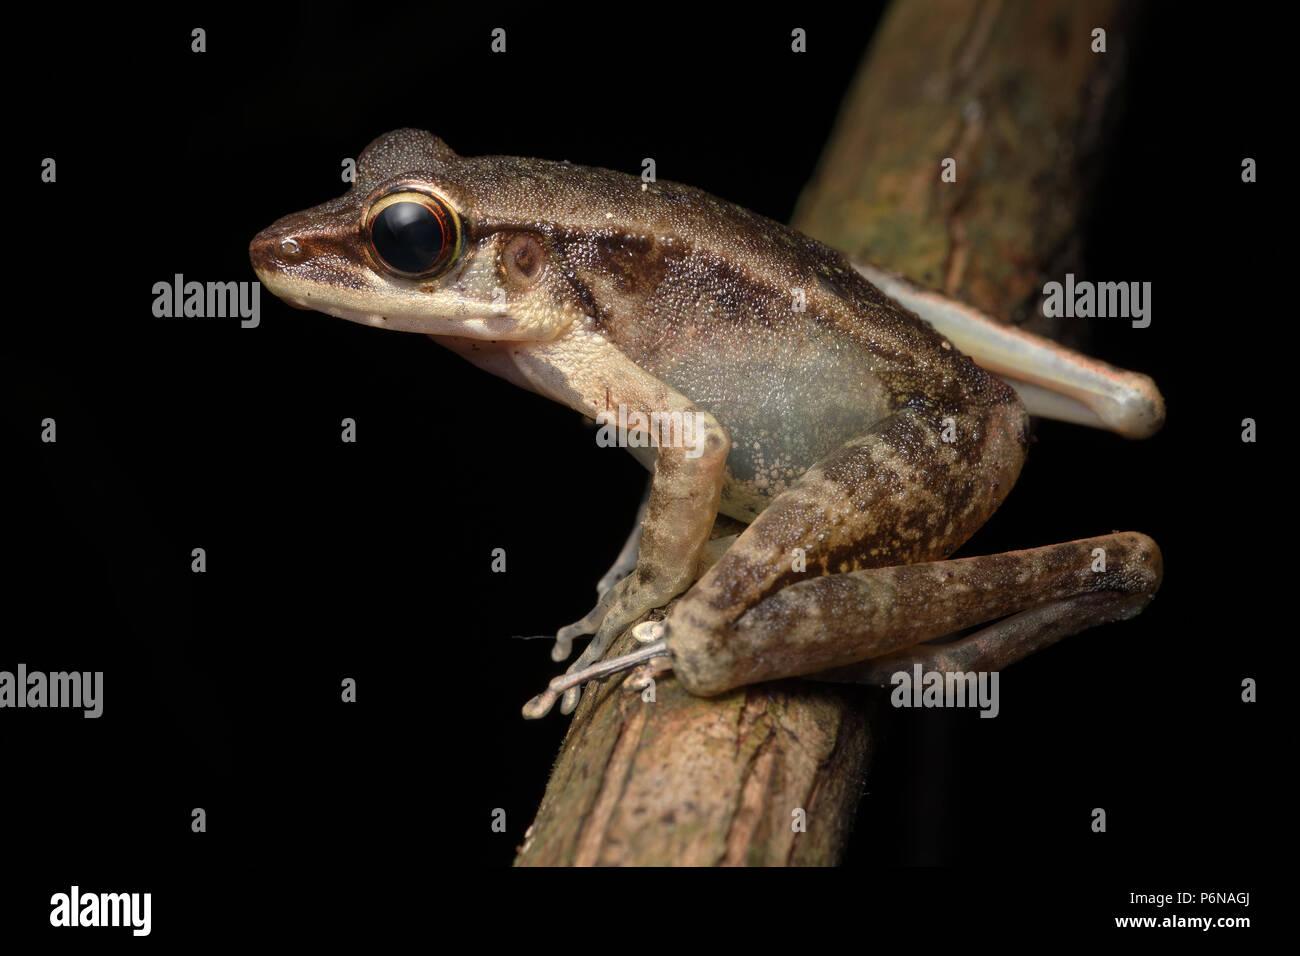 Northern torrent frog Meristogenys orphnocnemis - Stock Image